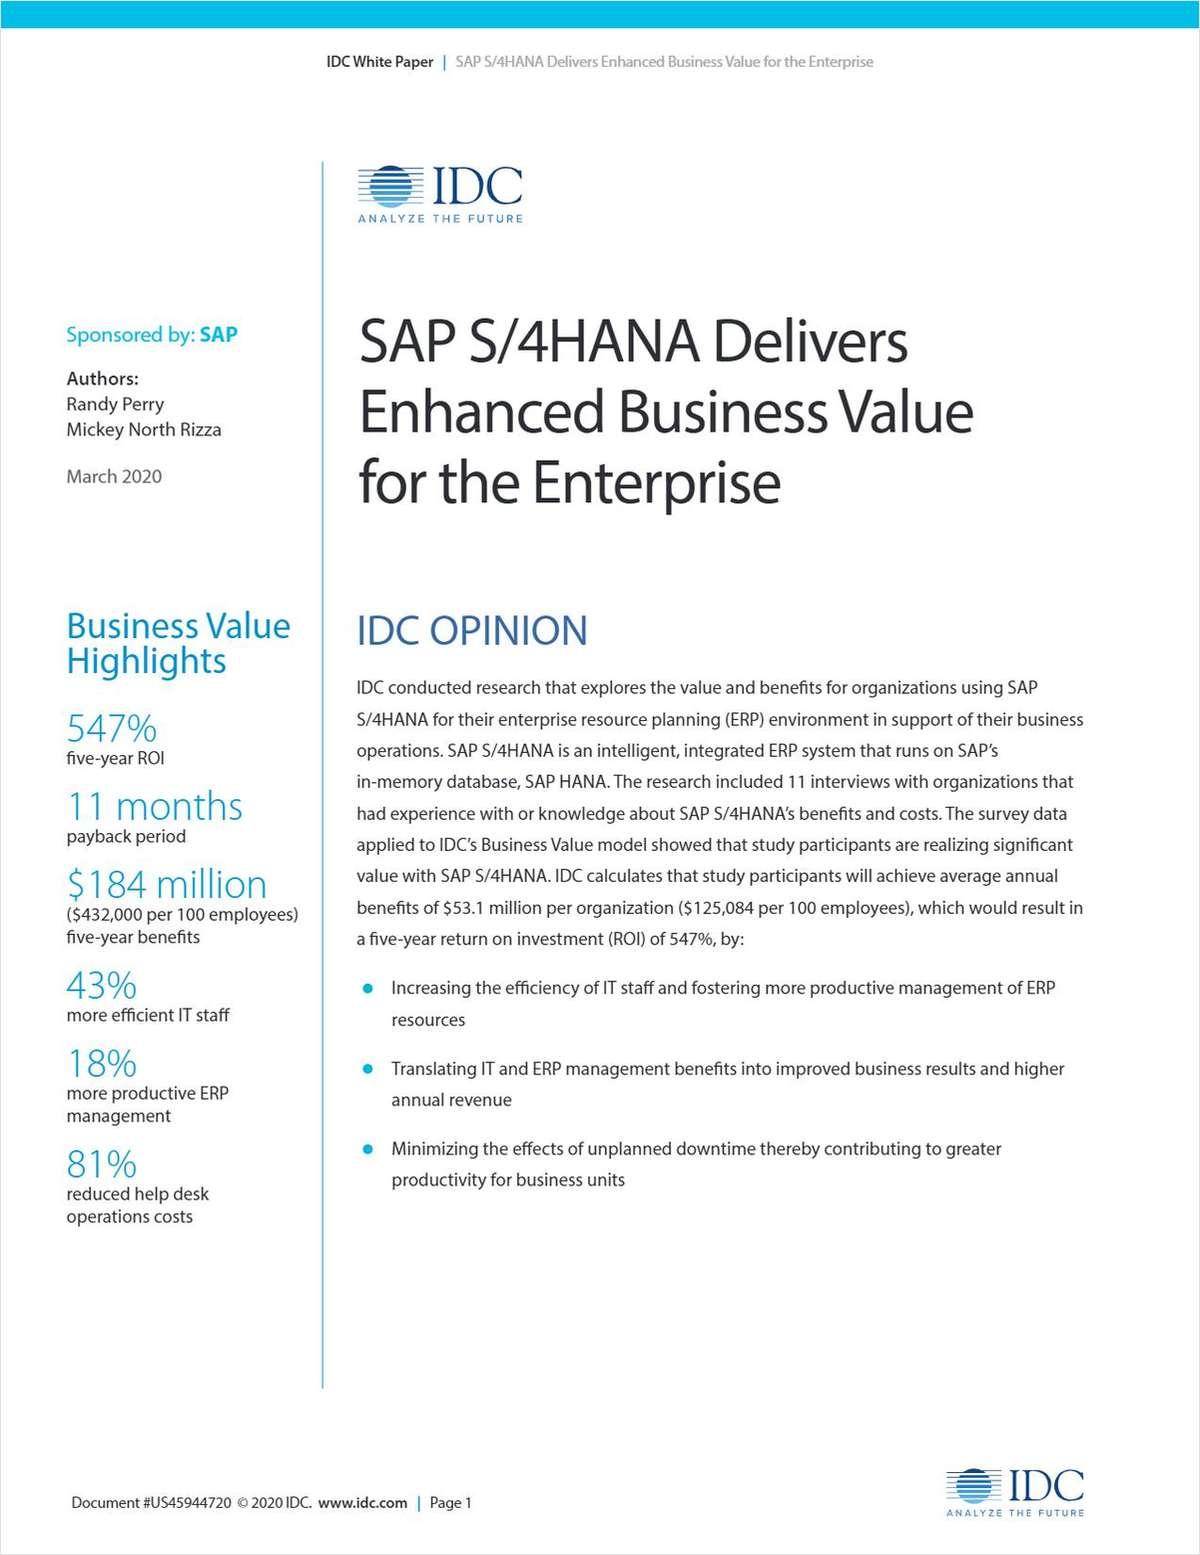 SAP S/4HANA Delivers Enhanced Business Value for the Enterprise